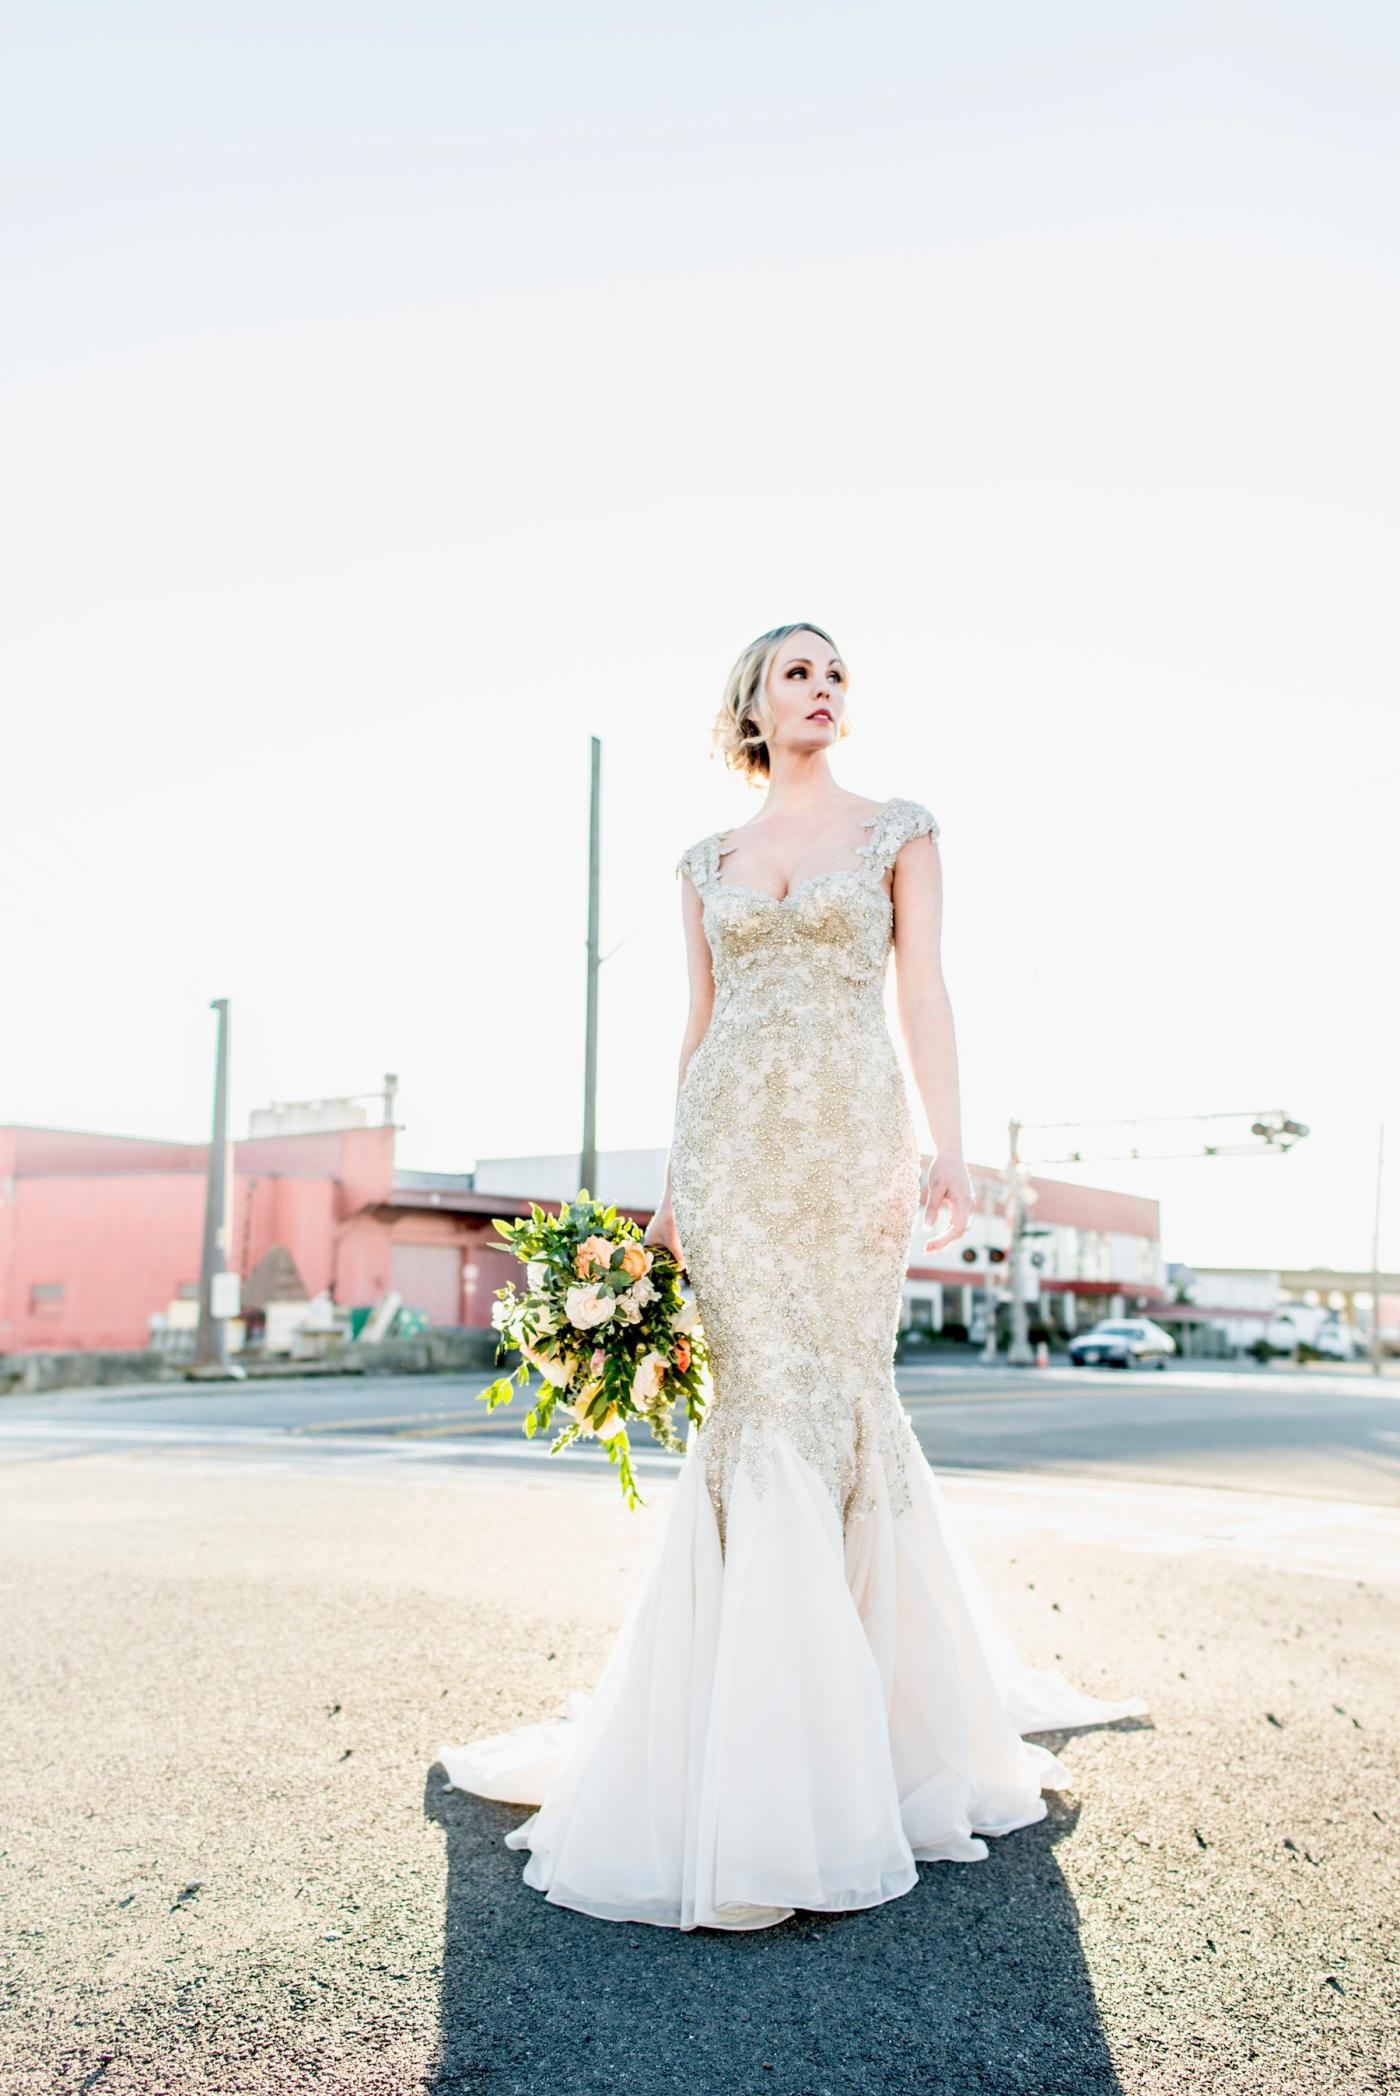 photography_by_jane_speleers_2017_wedding_show_i_do_sodo_within_designed_by_melody_davisdsc_0730